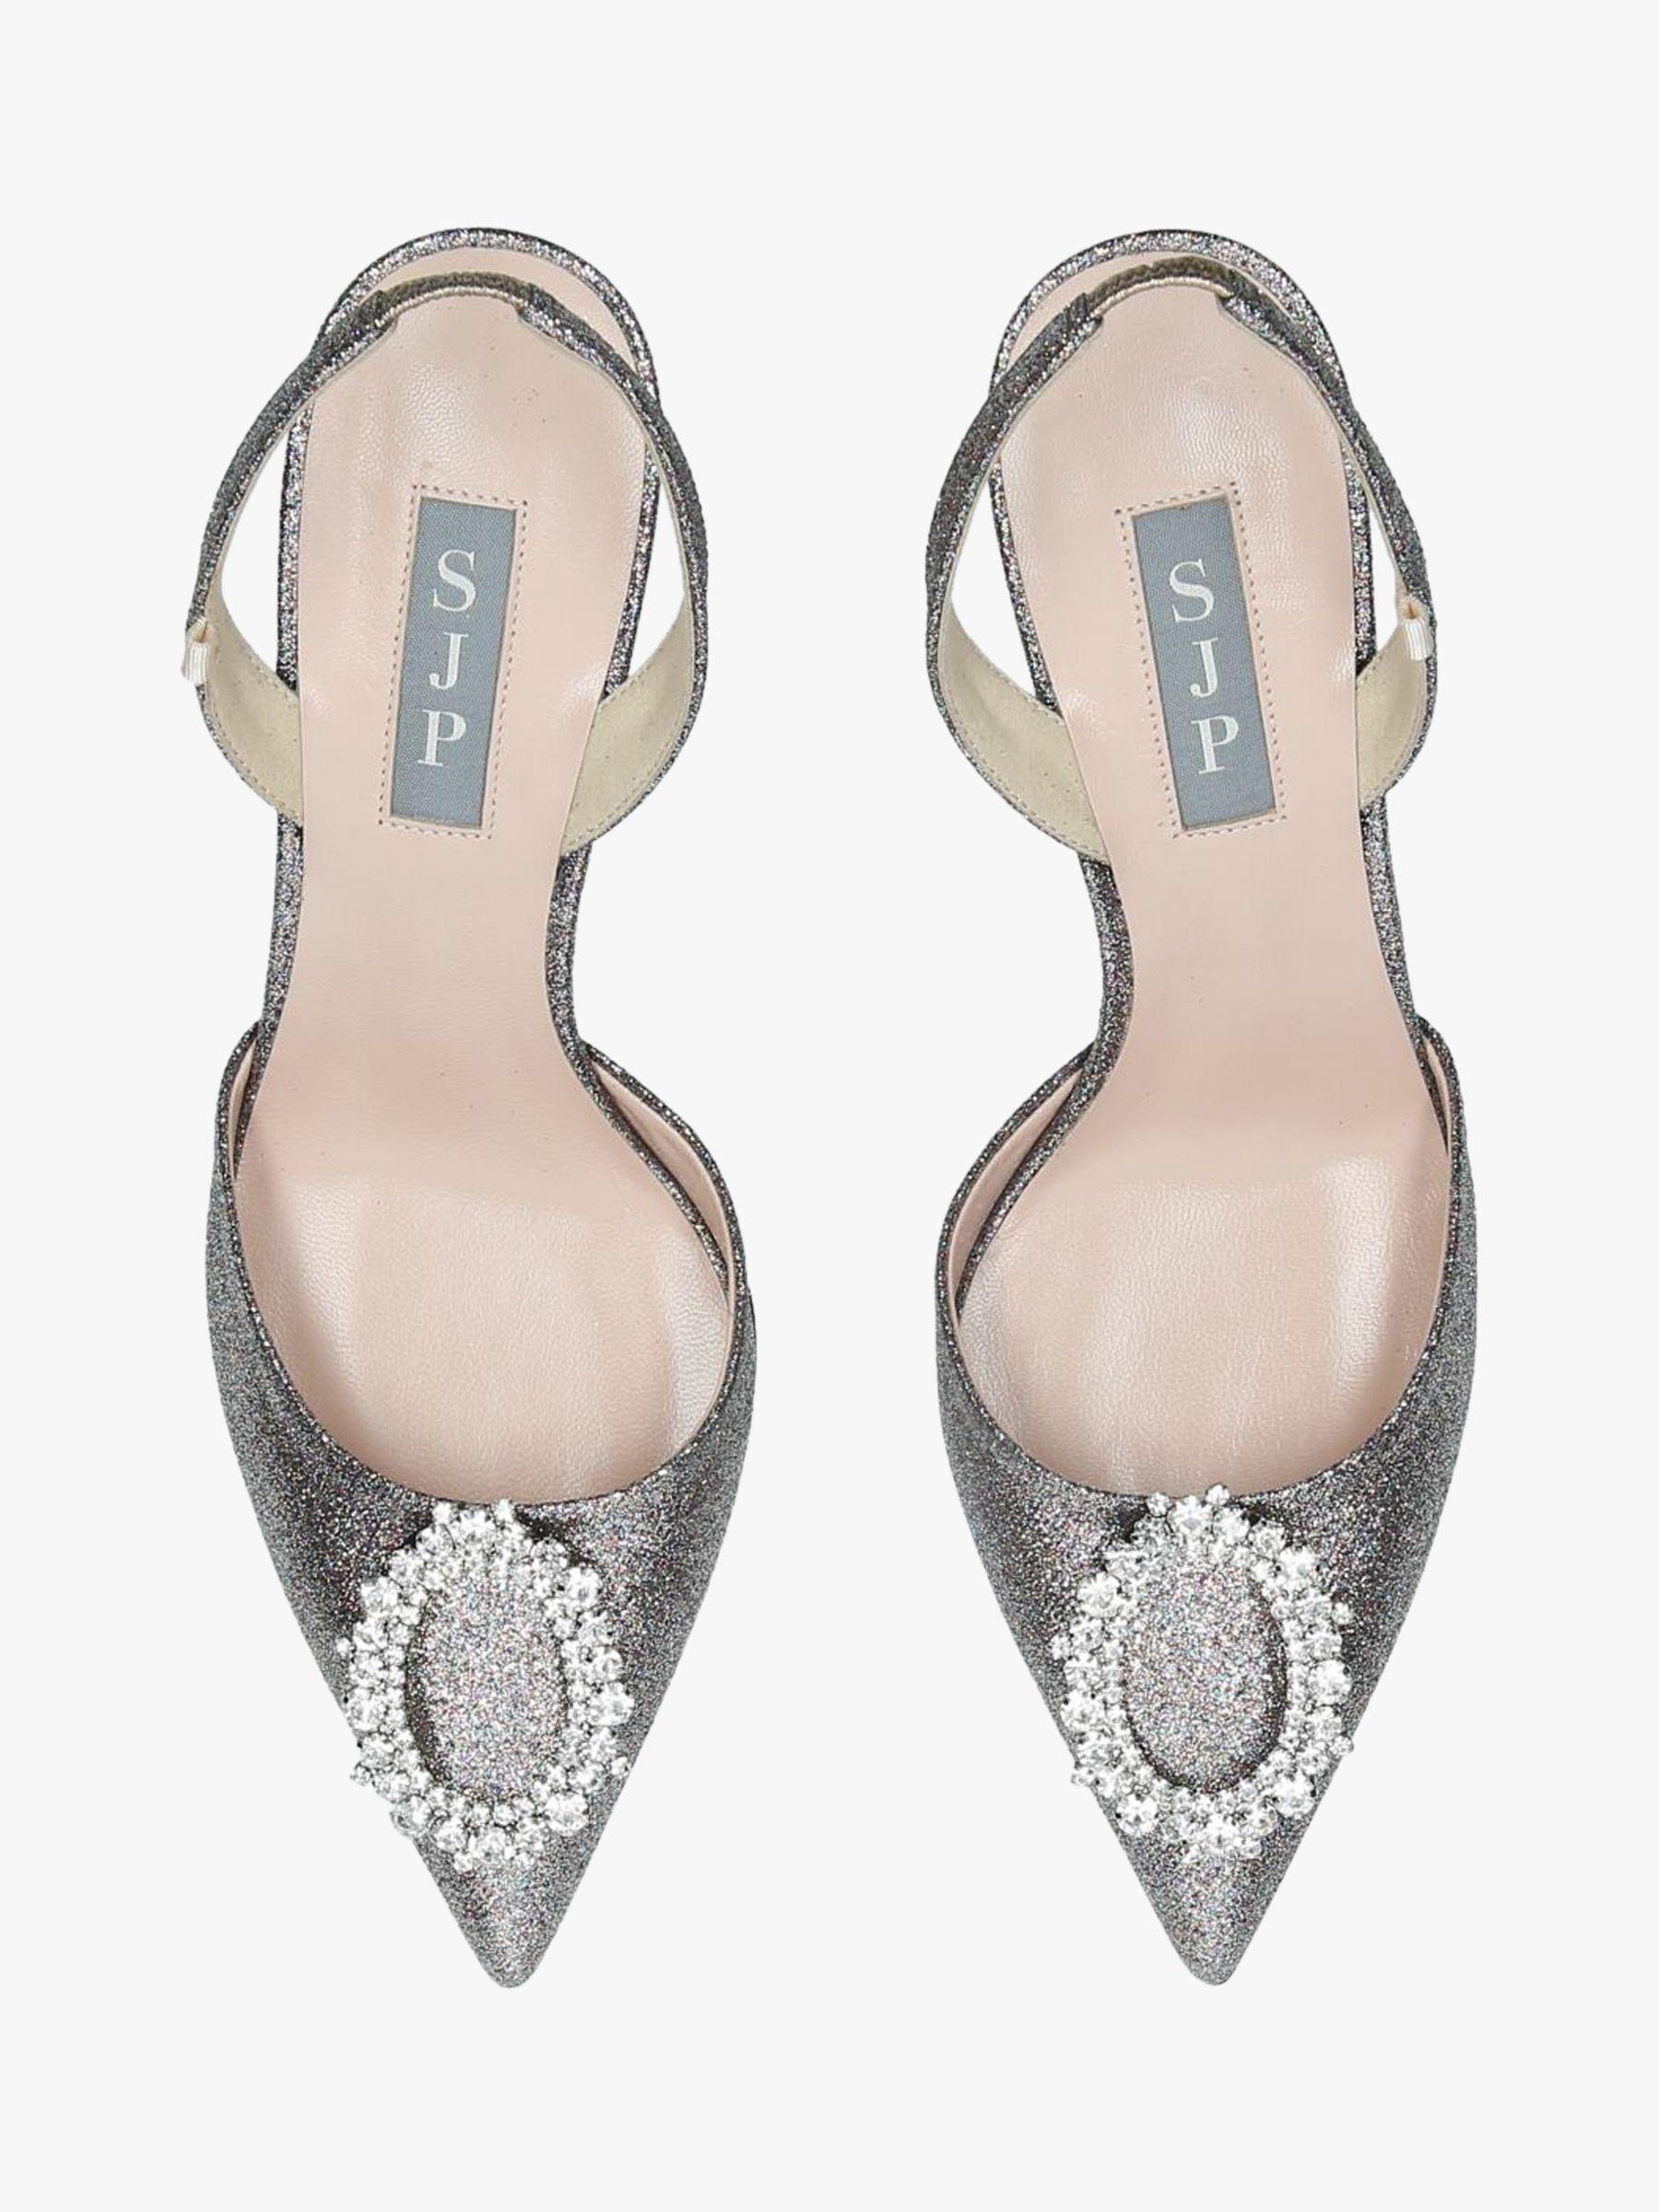 823645bdb51 SJP by Sarah Jessica Parker - Metallic Mabel Slingback Court Shoes - Lyst.  View fullscreen